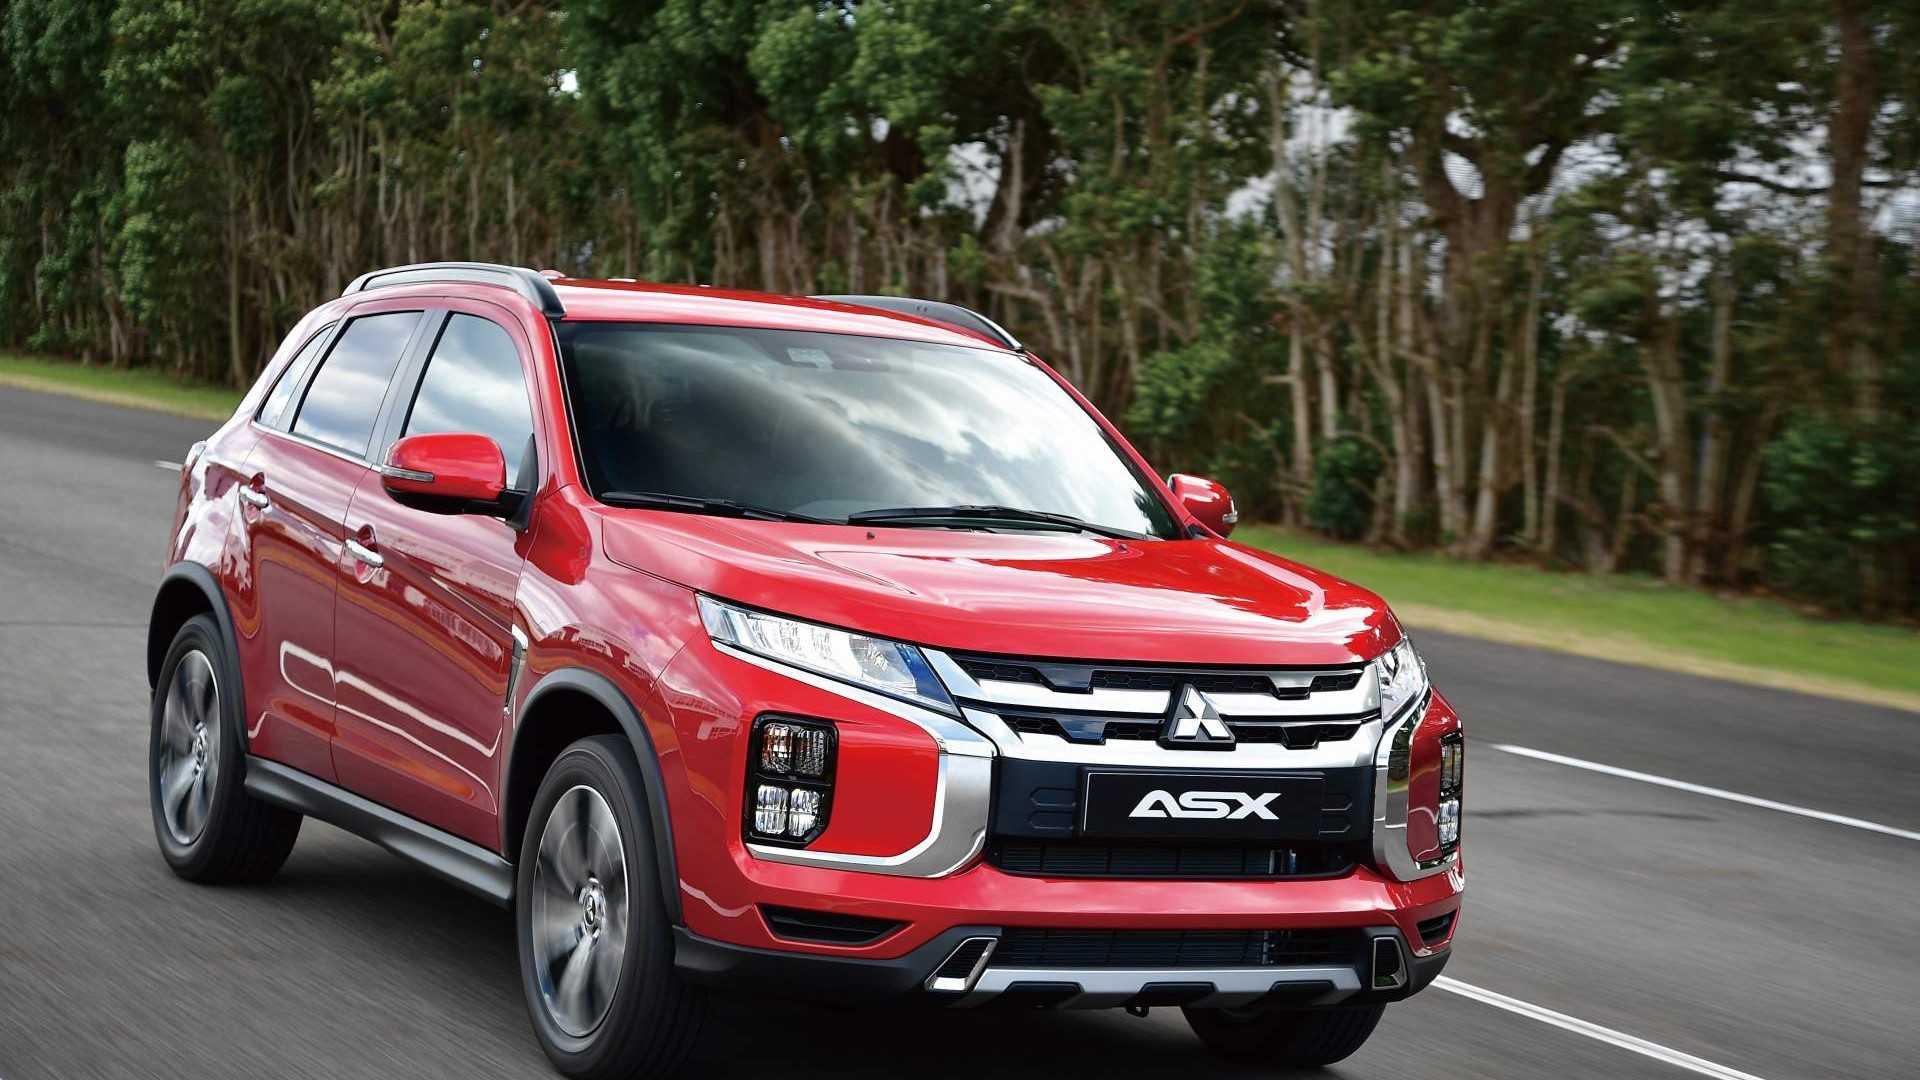 48 Concept of Uusi Mitsubishi Asx 2020 Ratings for Uusi Mitsubishi Asx 2020